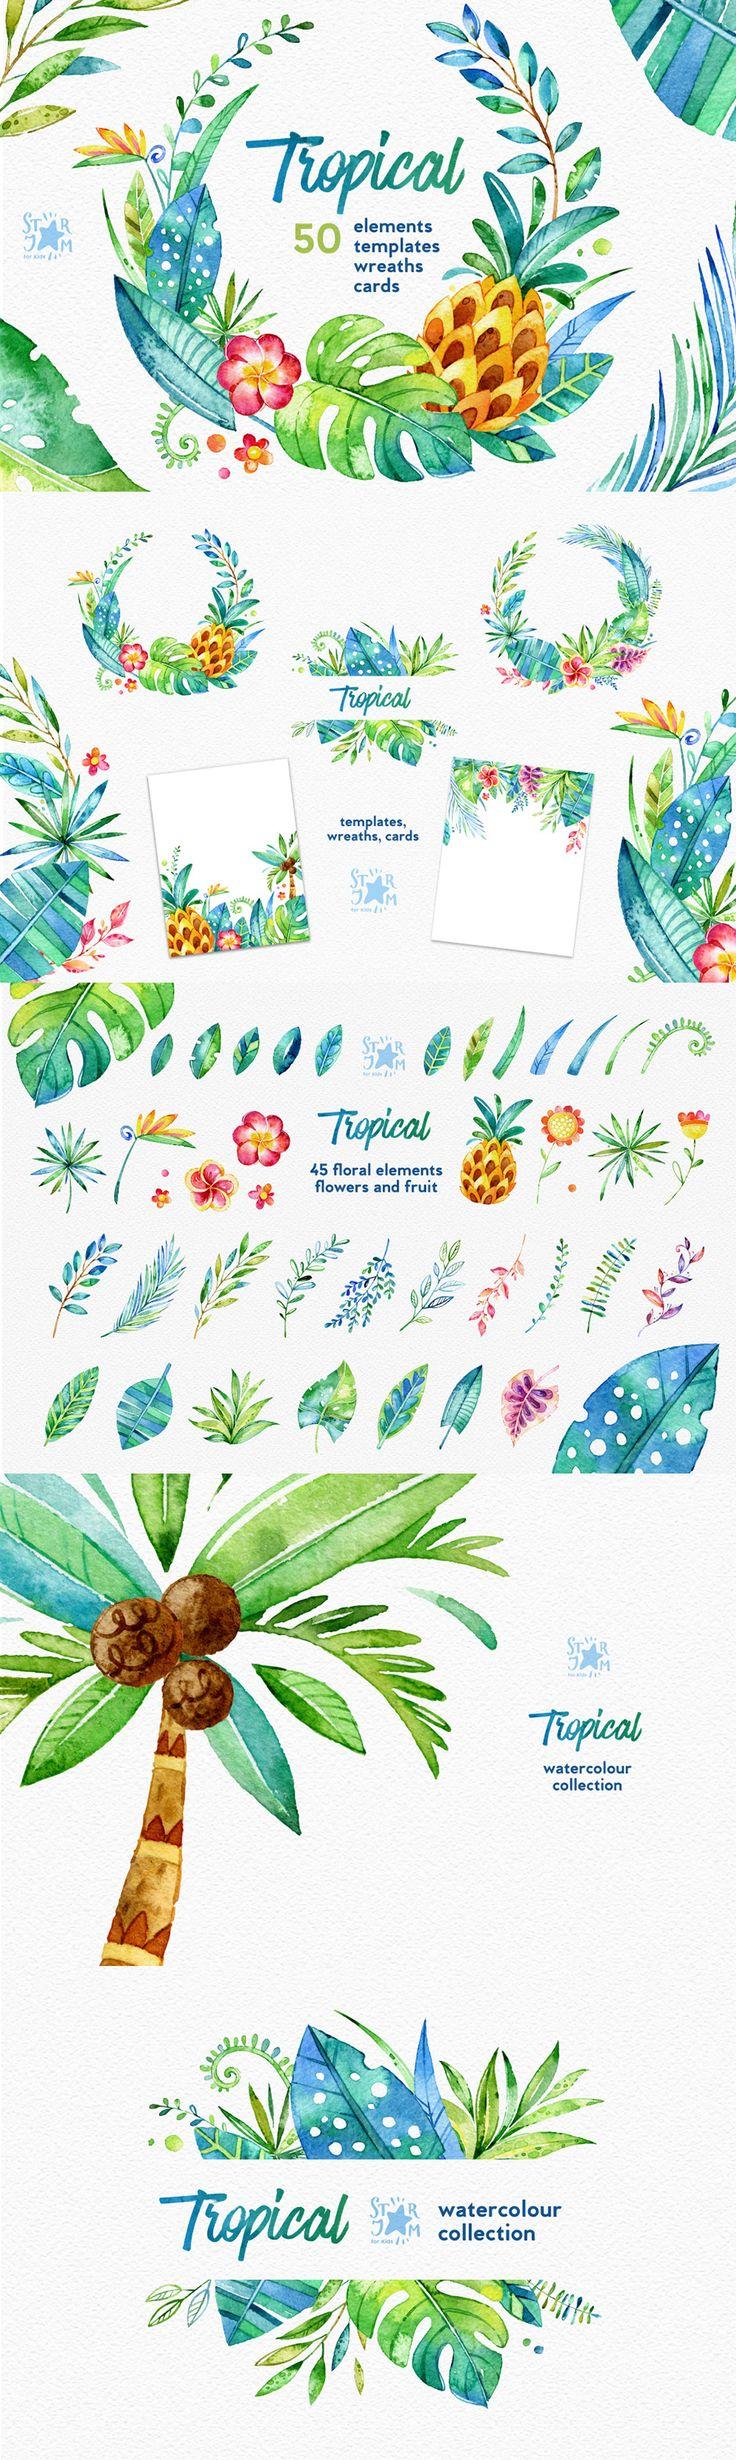 The Ultimate Artistic Design Bundle #DesignCuts #tropical #element #wreath…